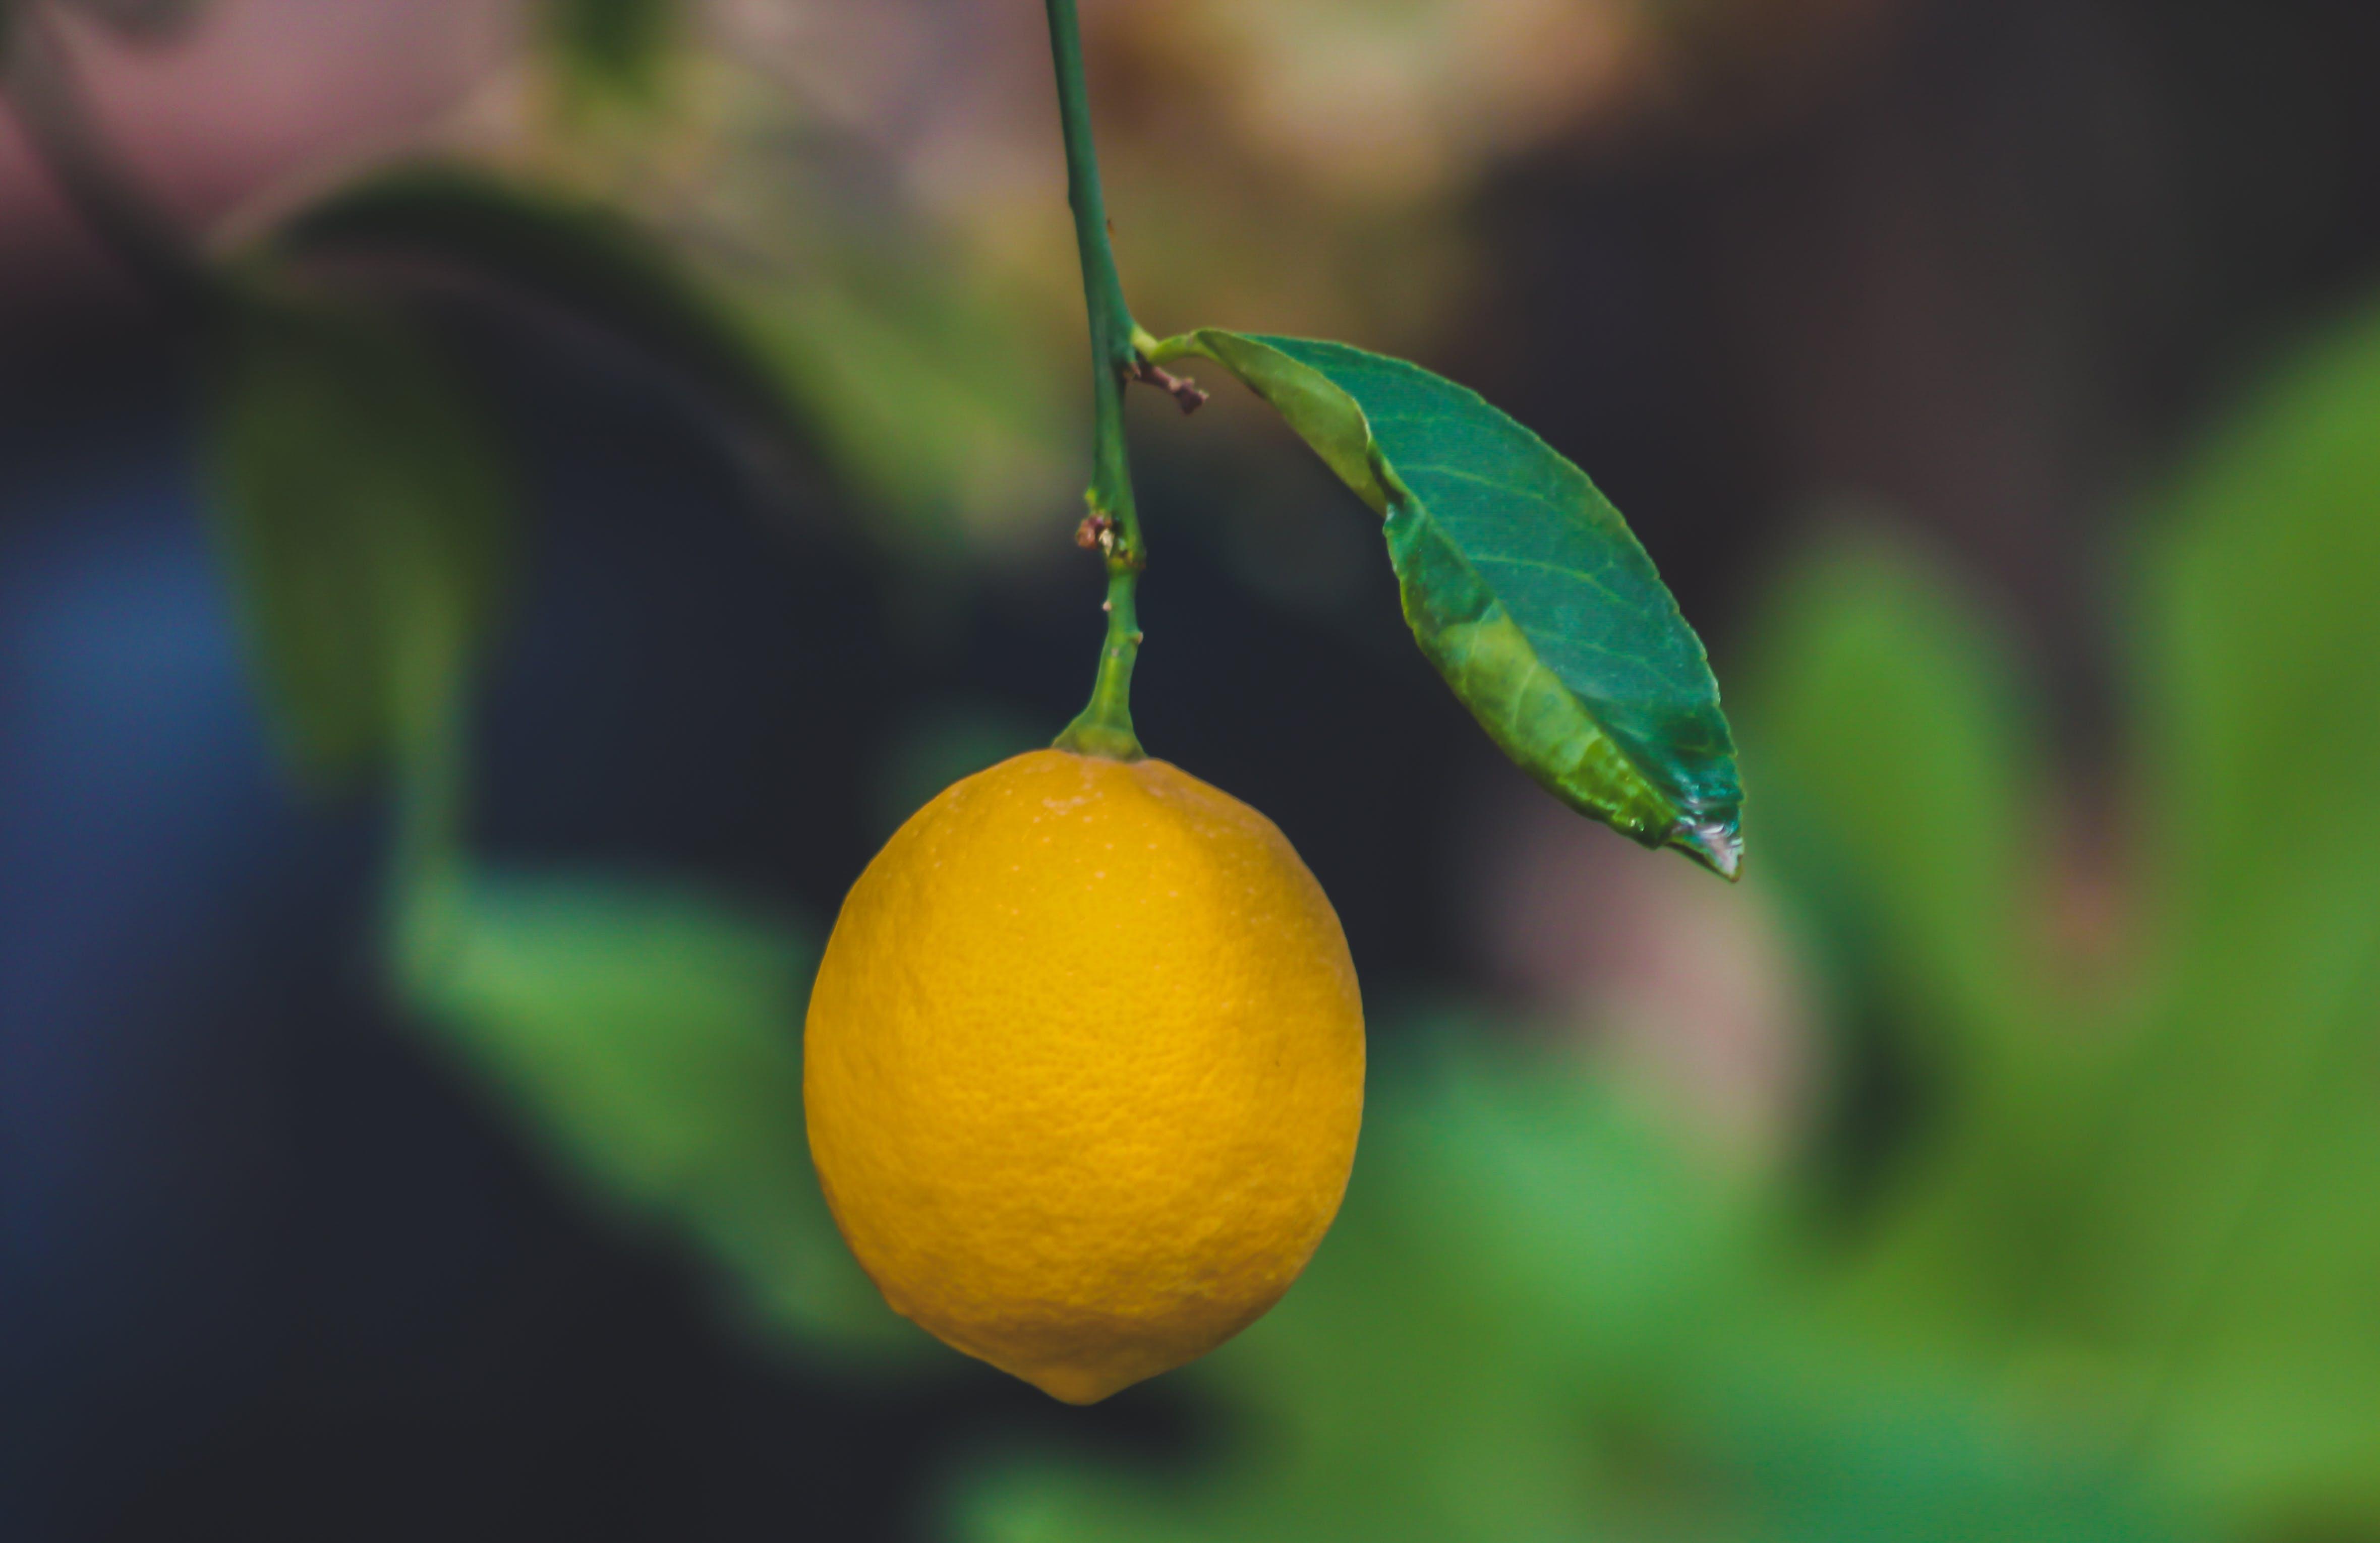 Focus Photo of a Ripe Lemon Fruit